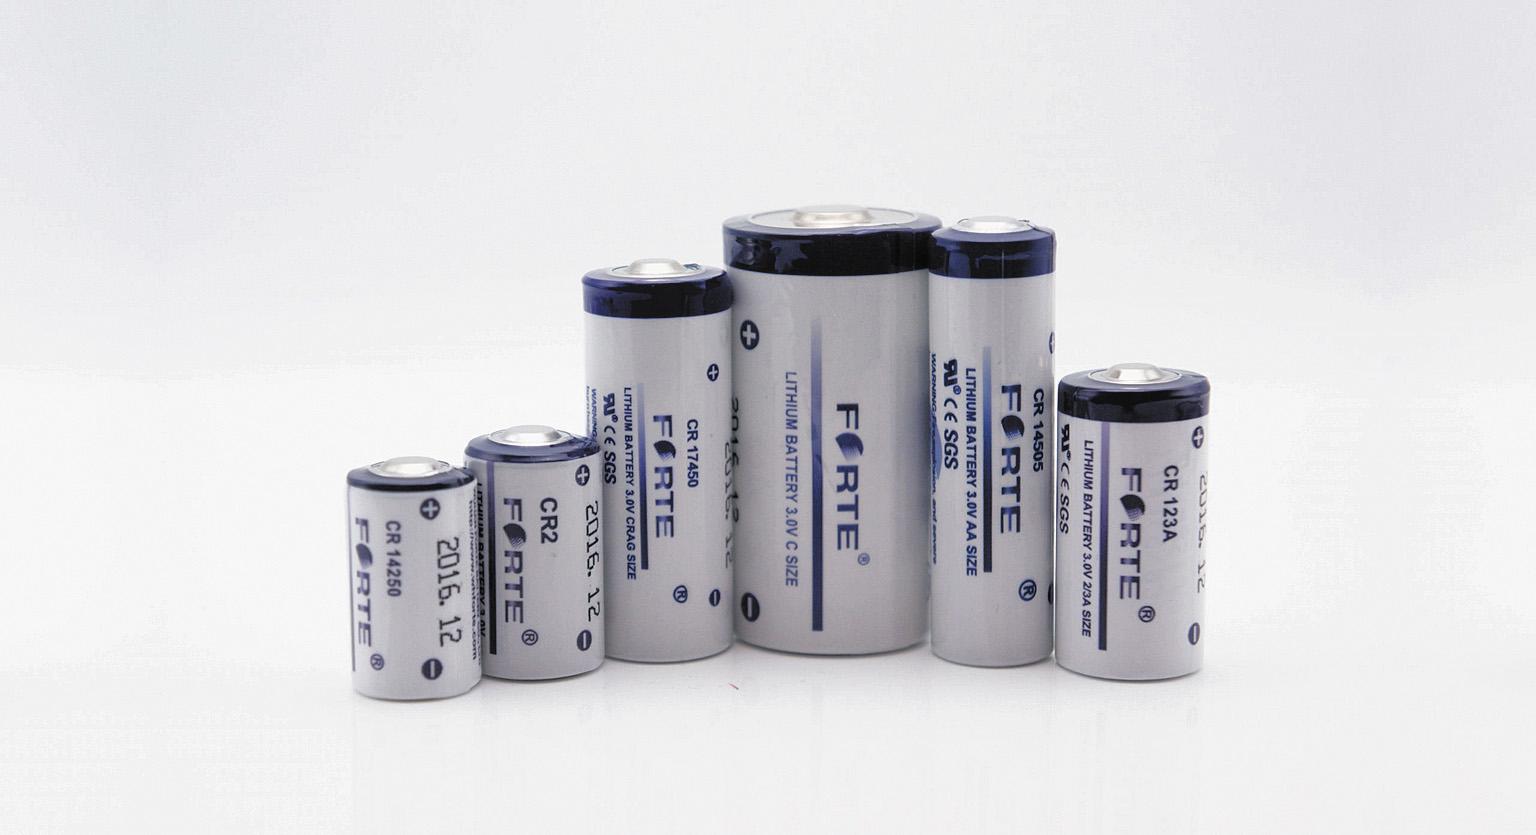 Литий-диоксидмарганцевые батареи